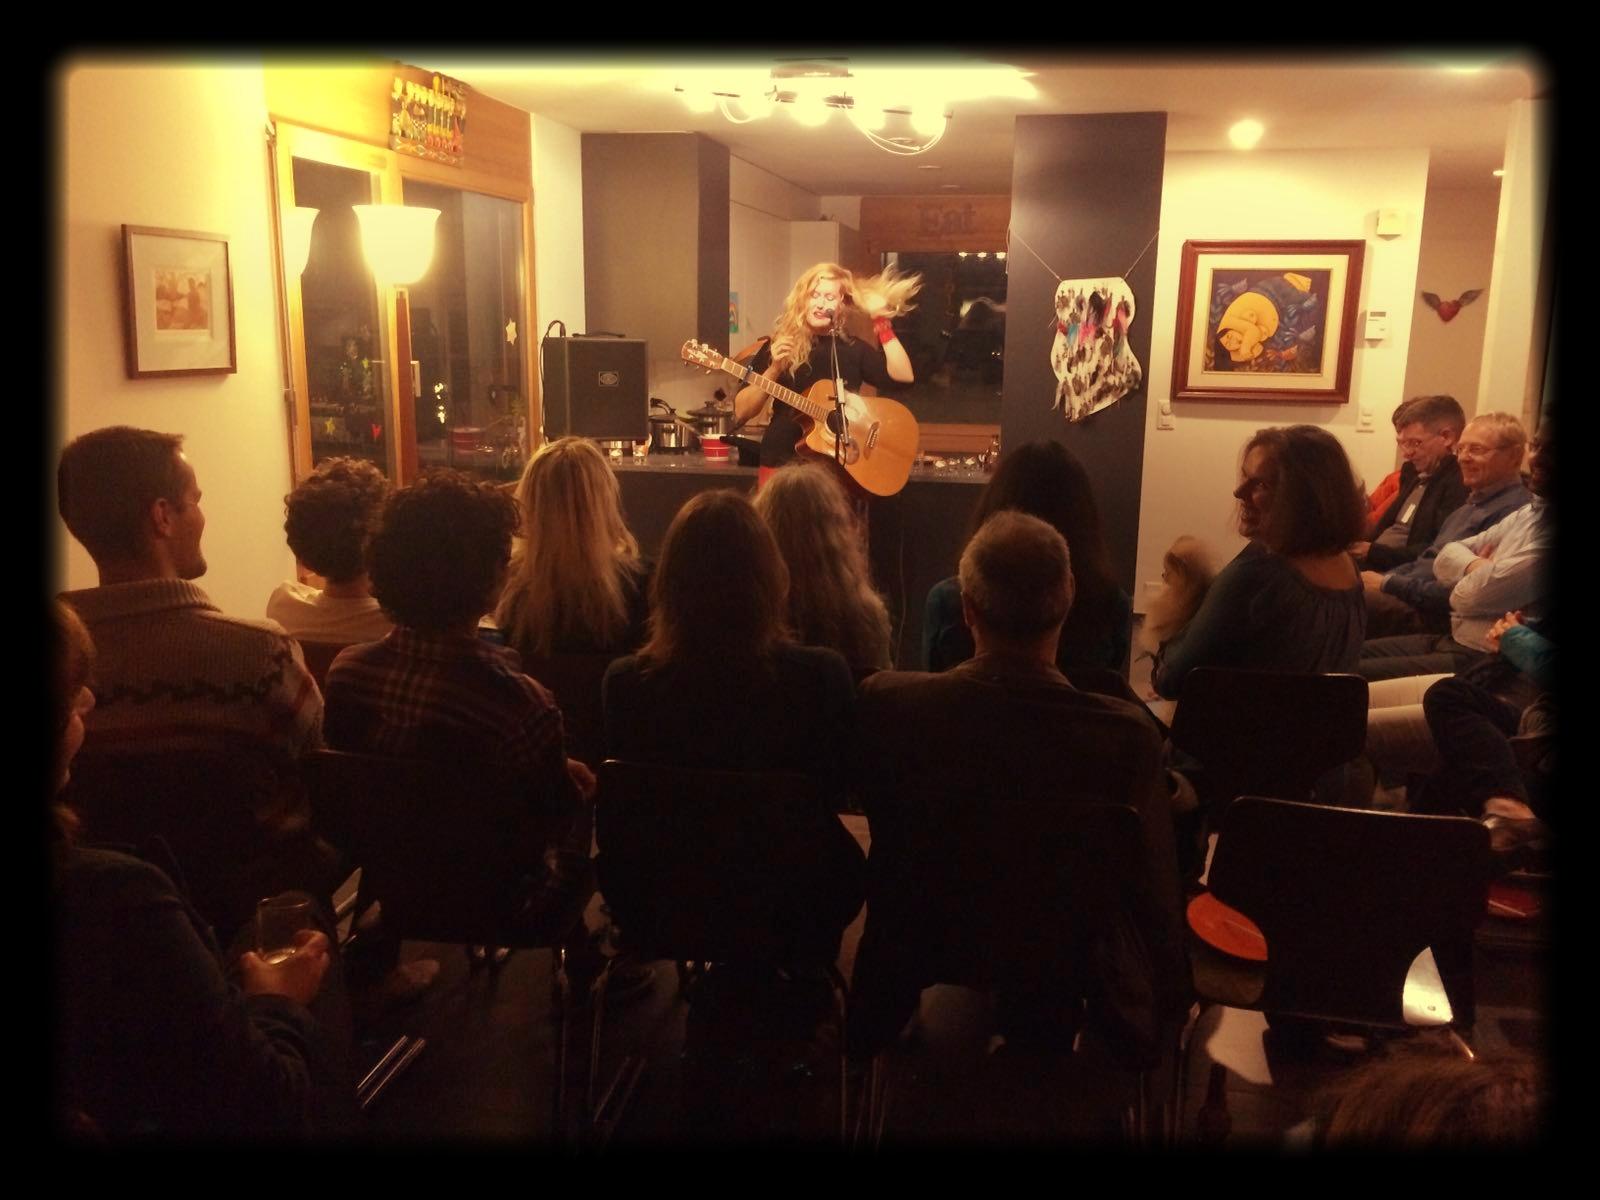 Lindsay_Live_at_a_House_Concert